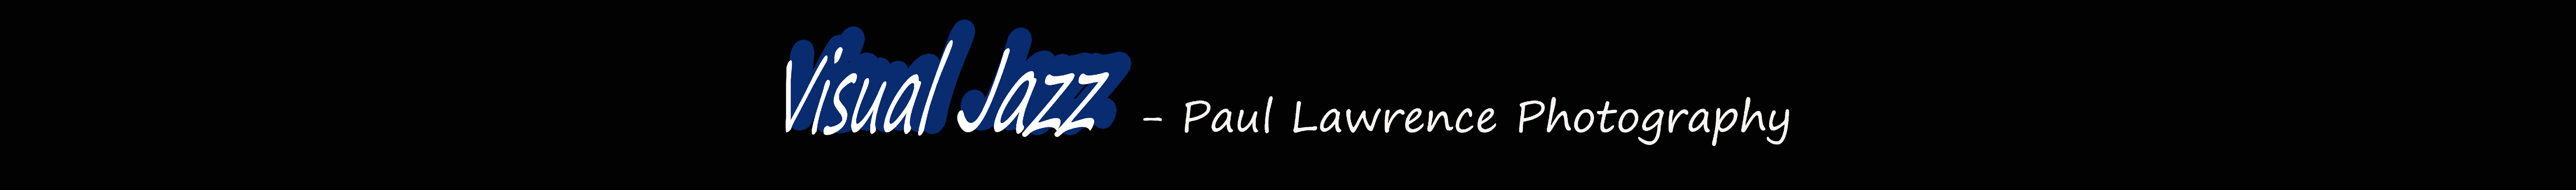 Visual Jazz - Paul Lawrence Photography